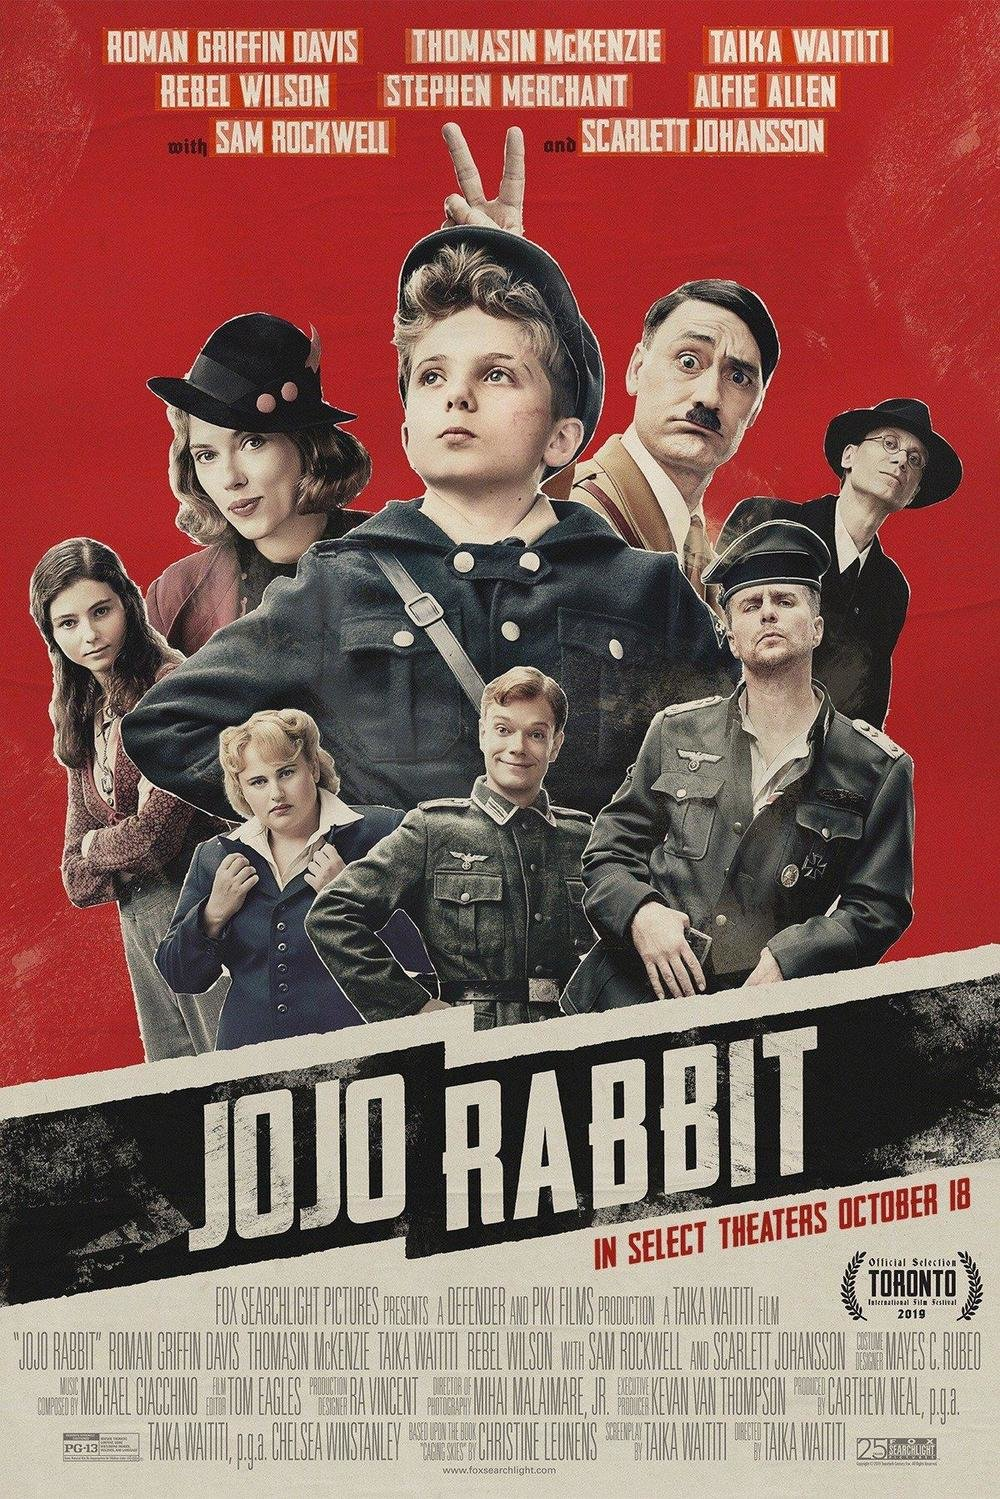 affiche du film Jojo Rabbit